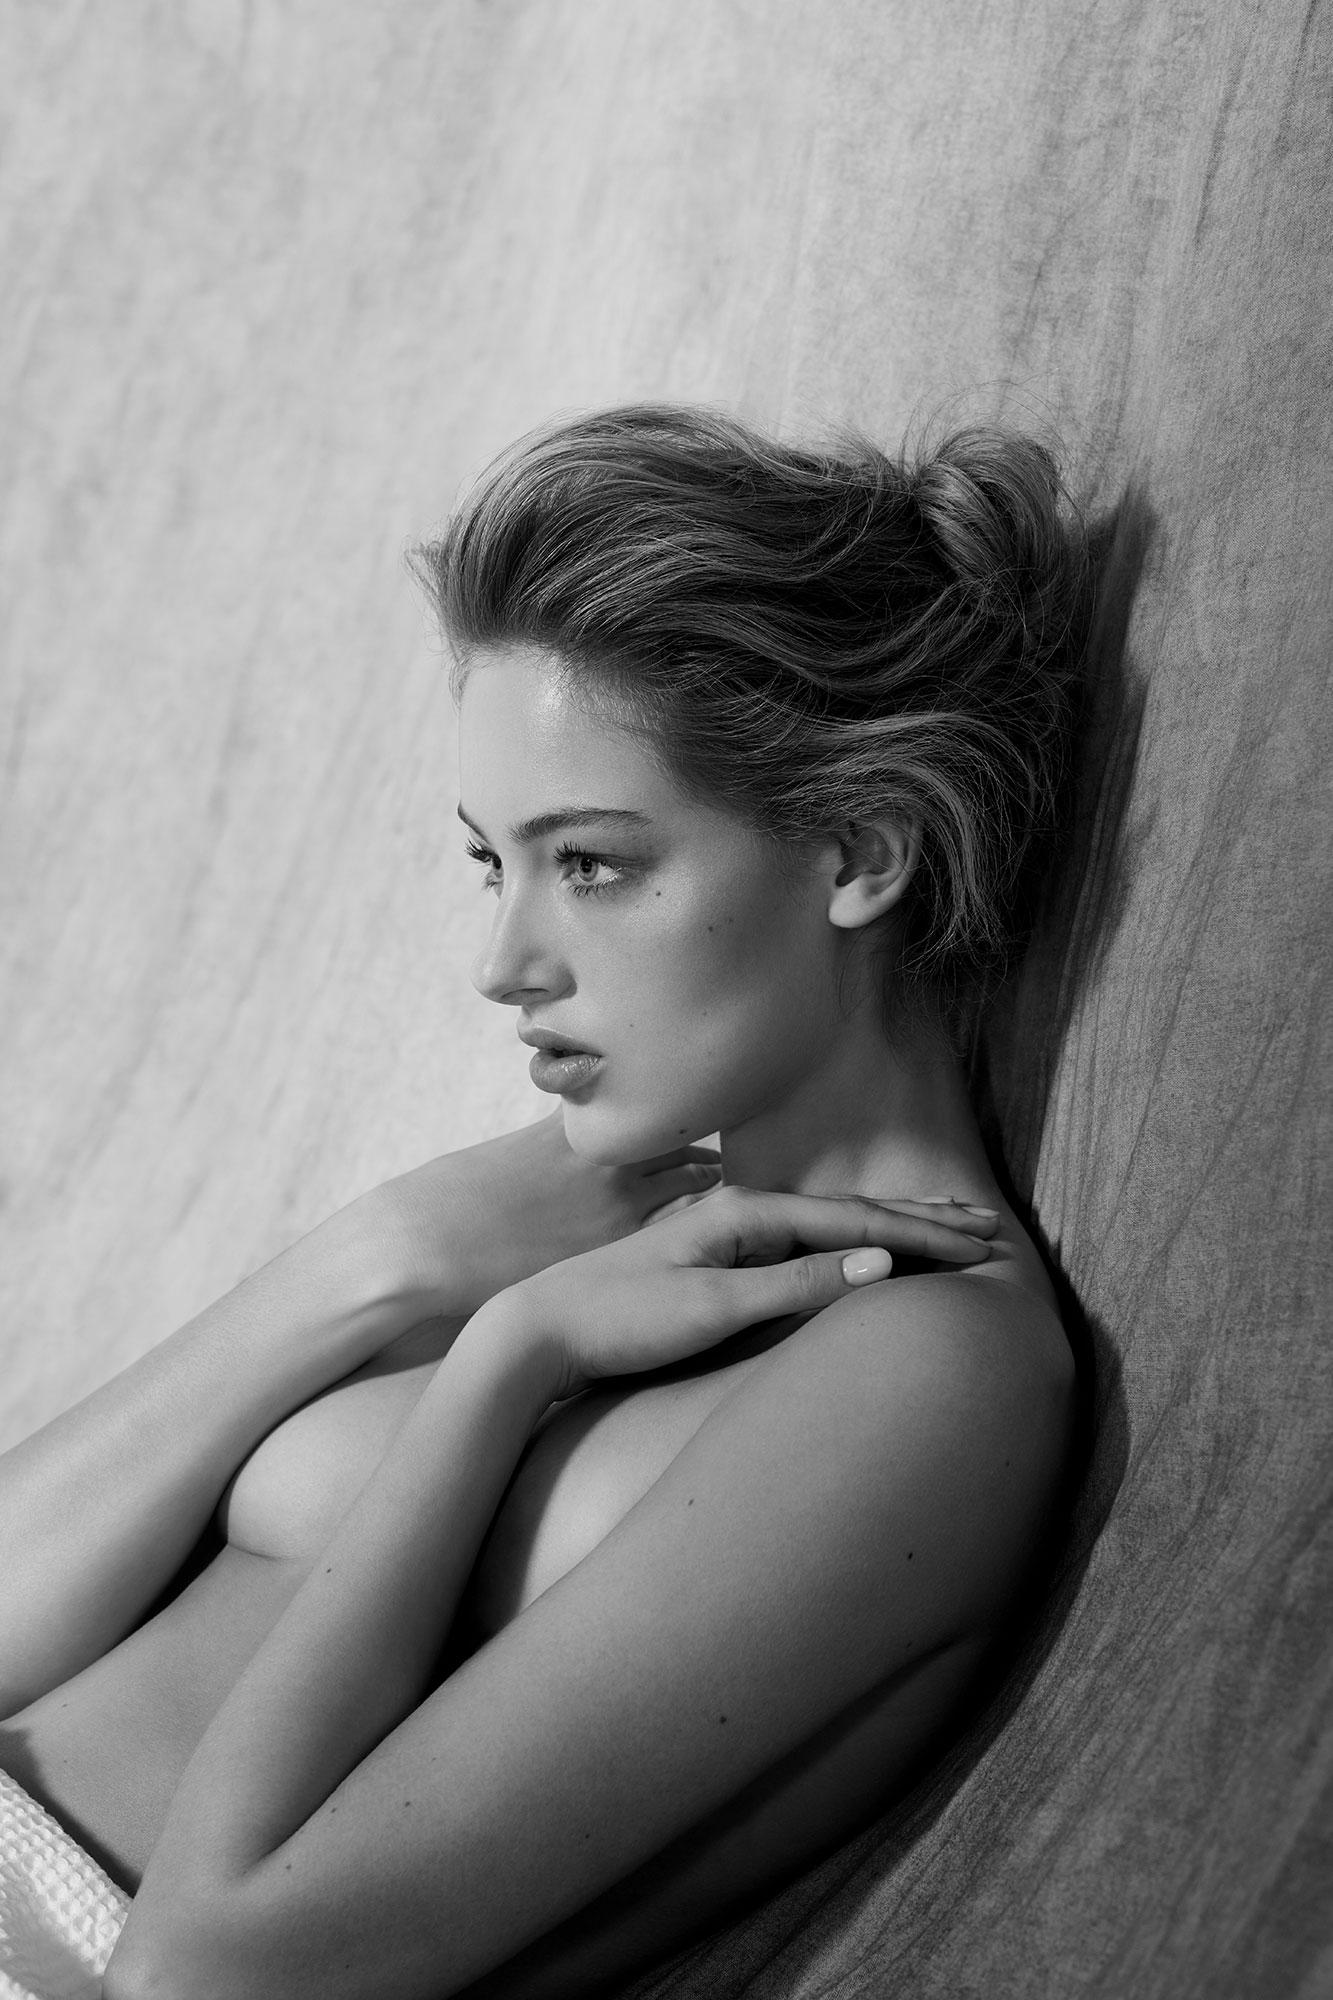 Vanity Fair May 2018 | Jean-Philippe Malaval | Vanity Fair Italia | Numerique Retouch Photo Retouching Studio